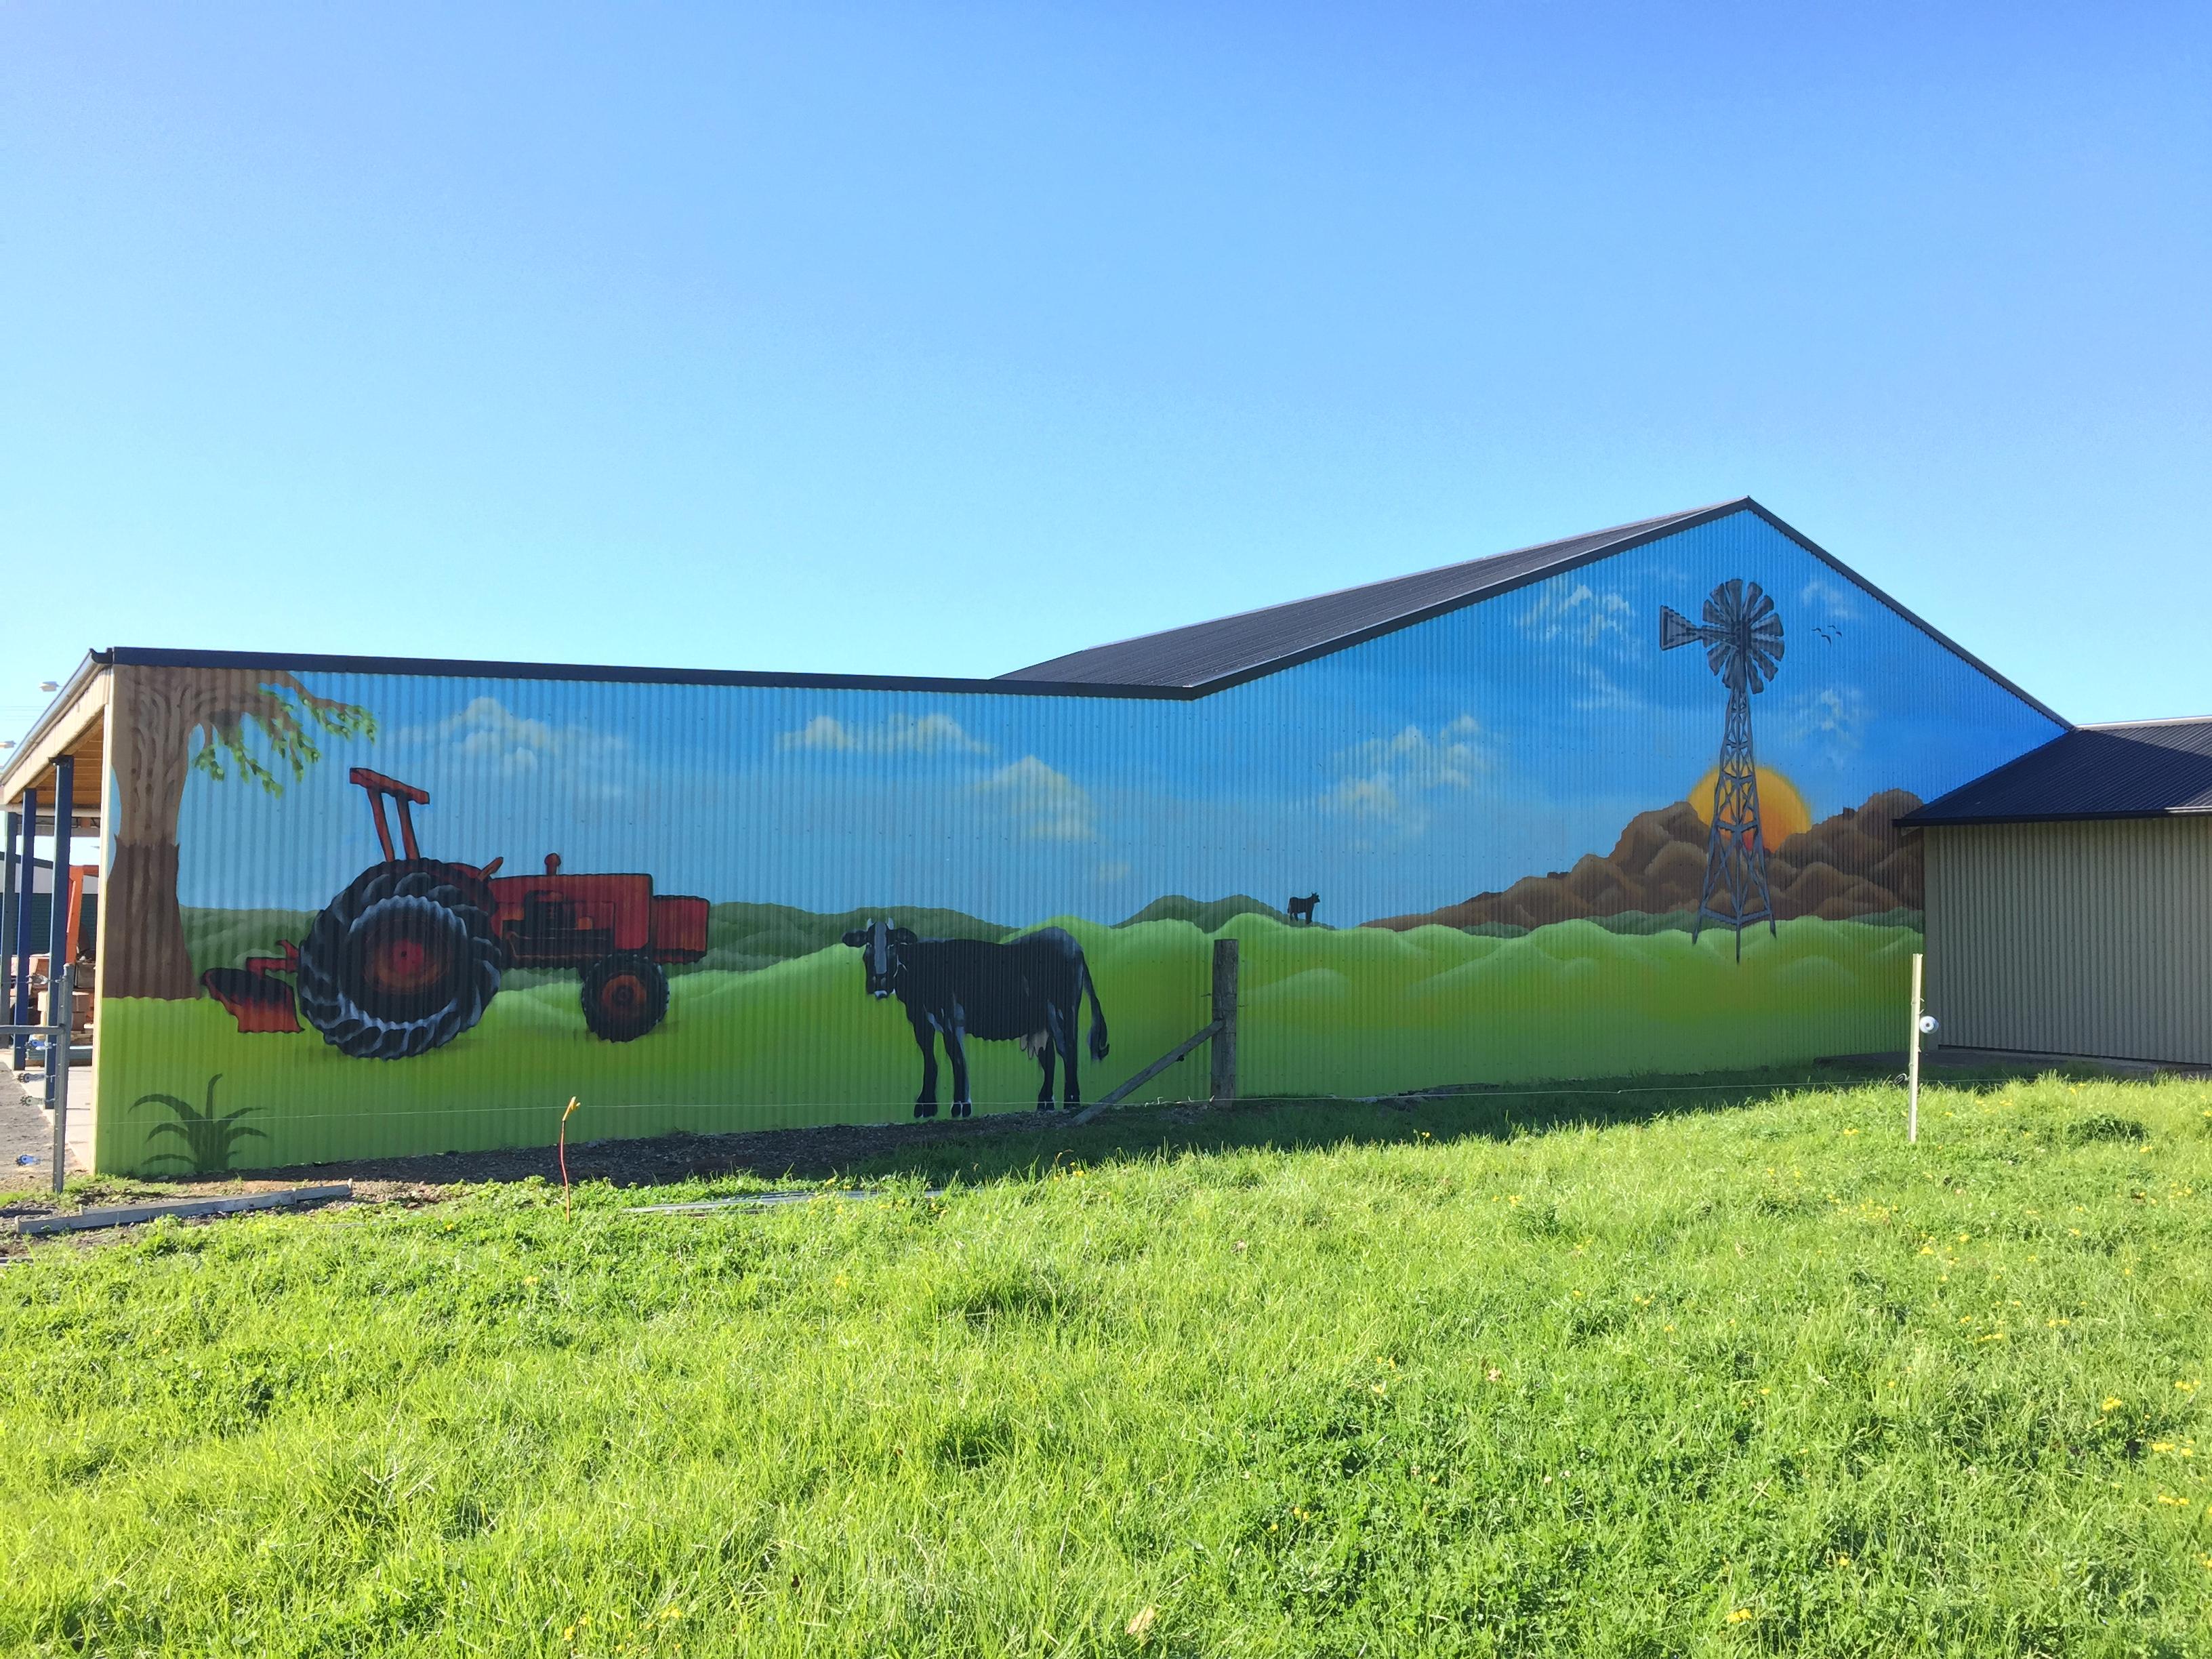 huge farm mural on shed